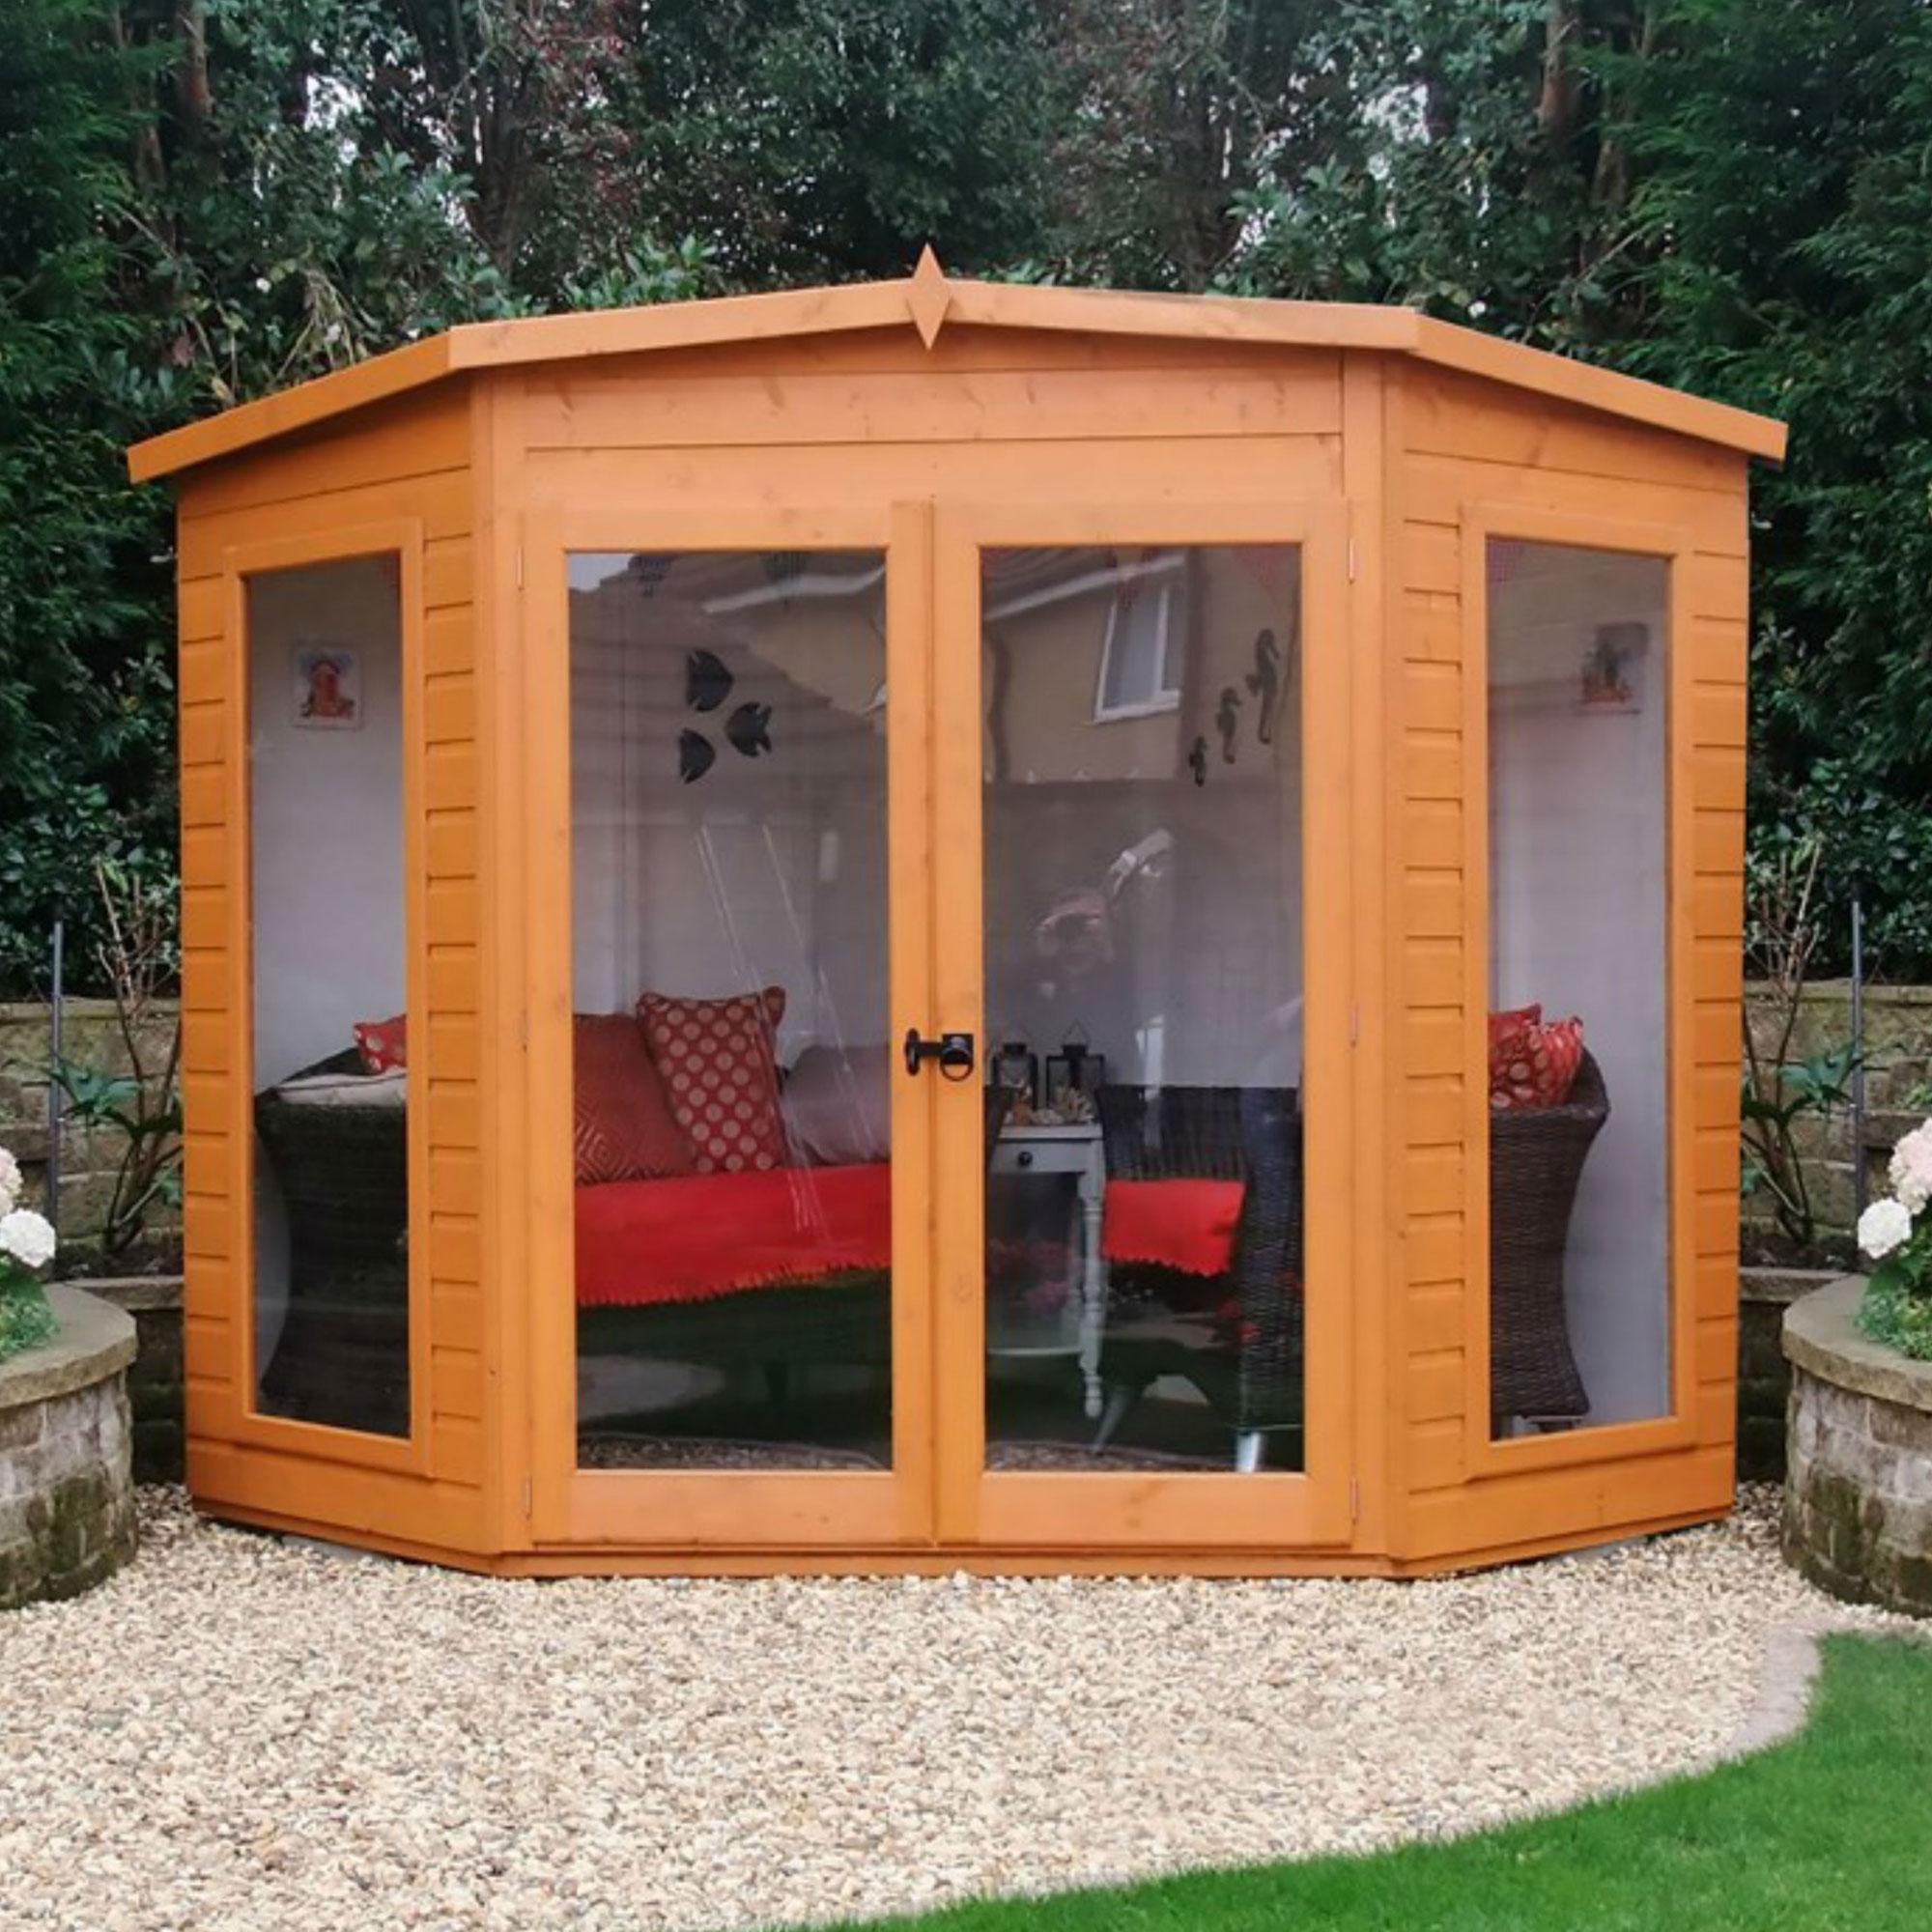 7' x 7' Shire Barclay Corner Wooden Summerhouse